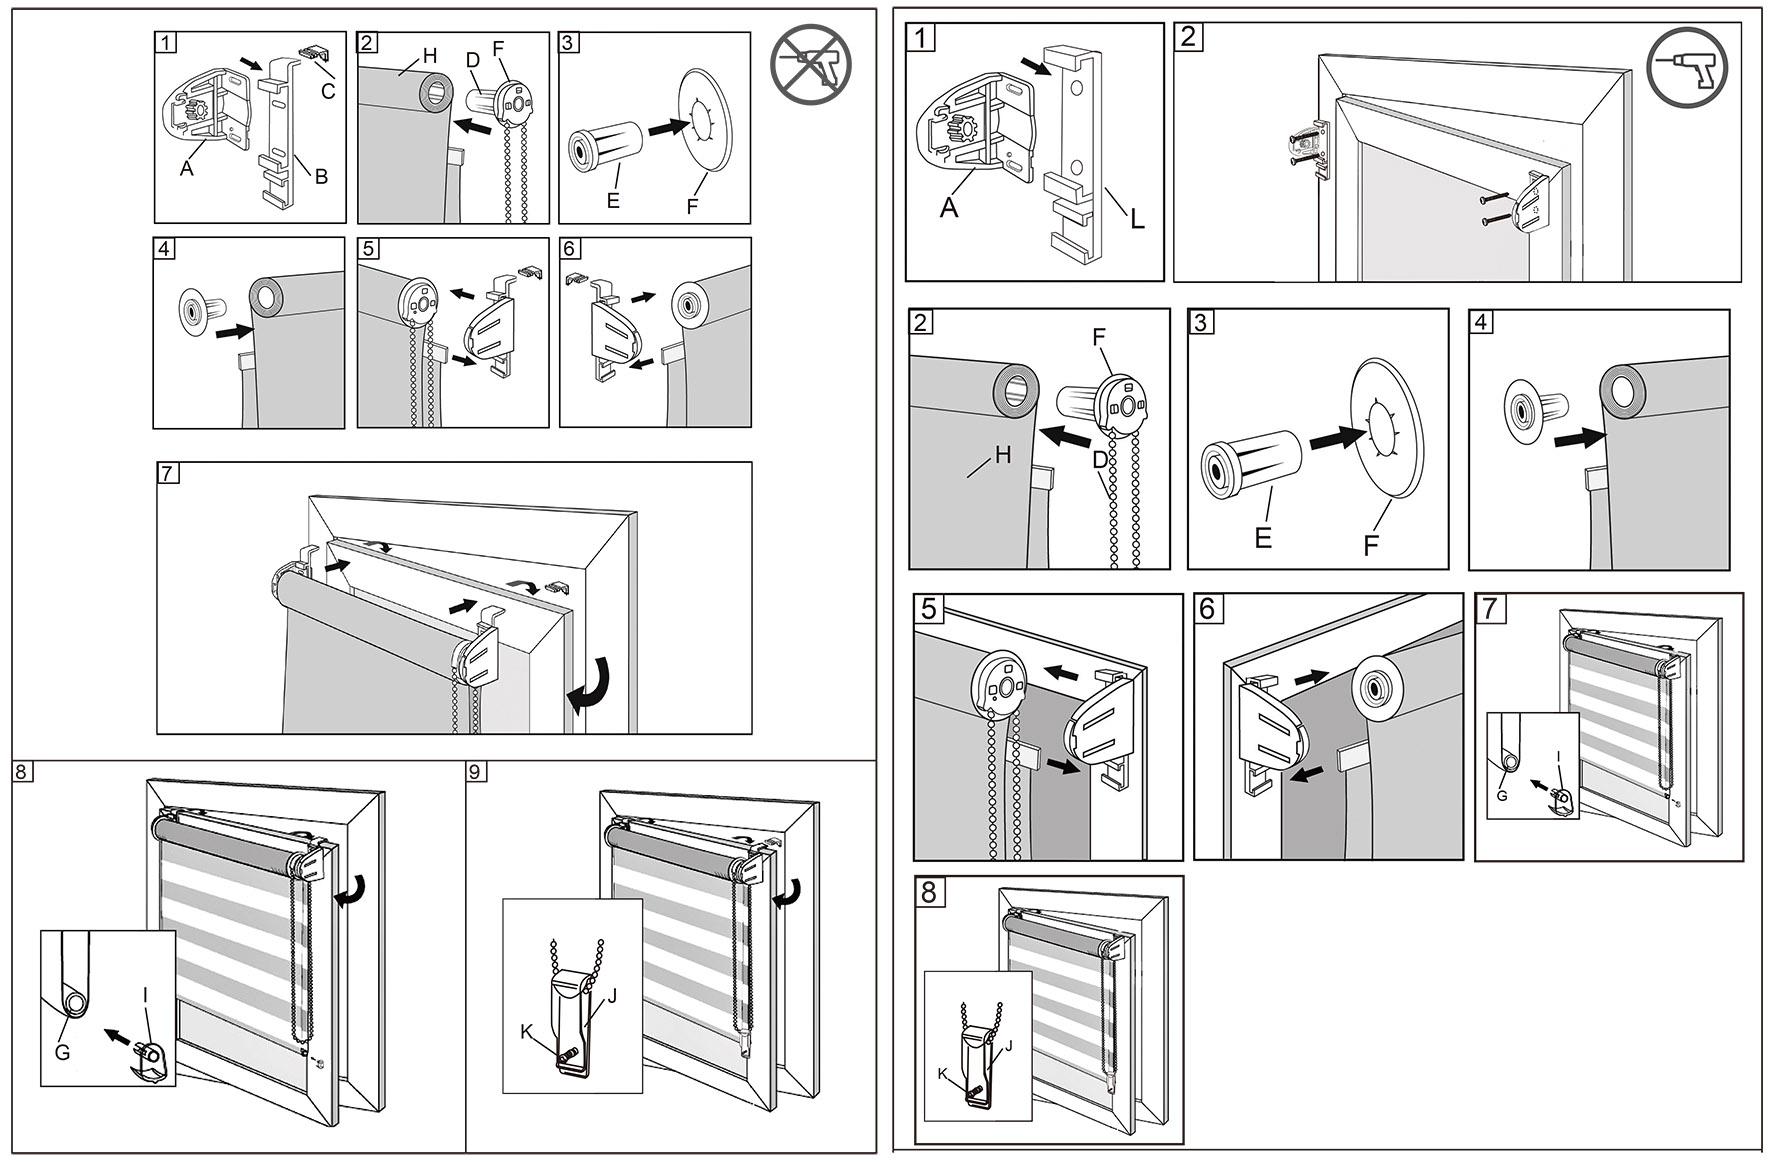 doppelrollo duo rollo klemmfix ohne bohren variorollo easyfix fenster t r 324 a ebay. Black Bedroom Furniture Sets. Home Design Ideas